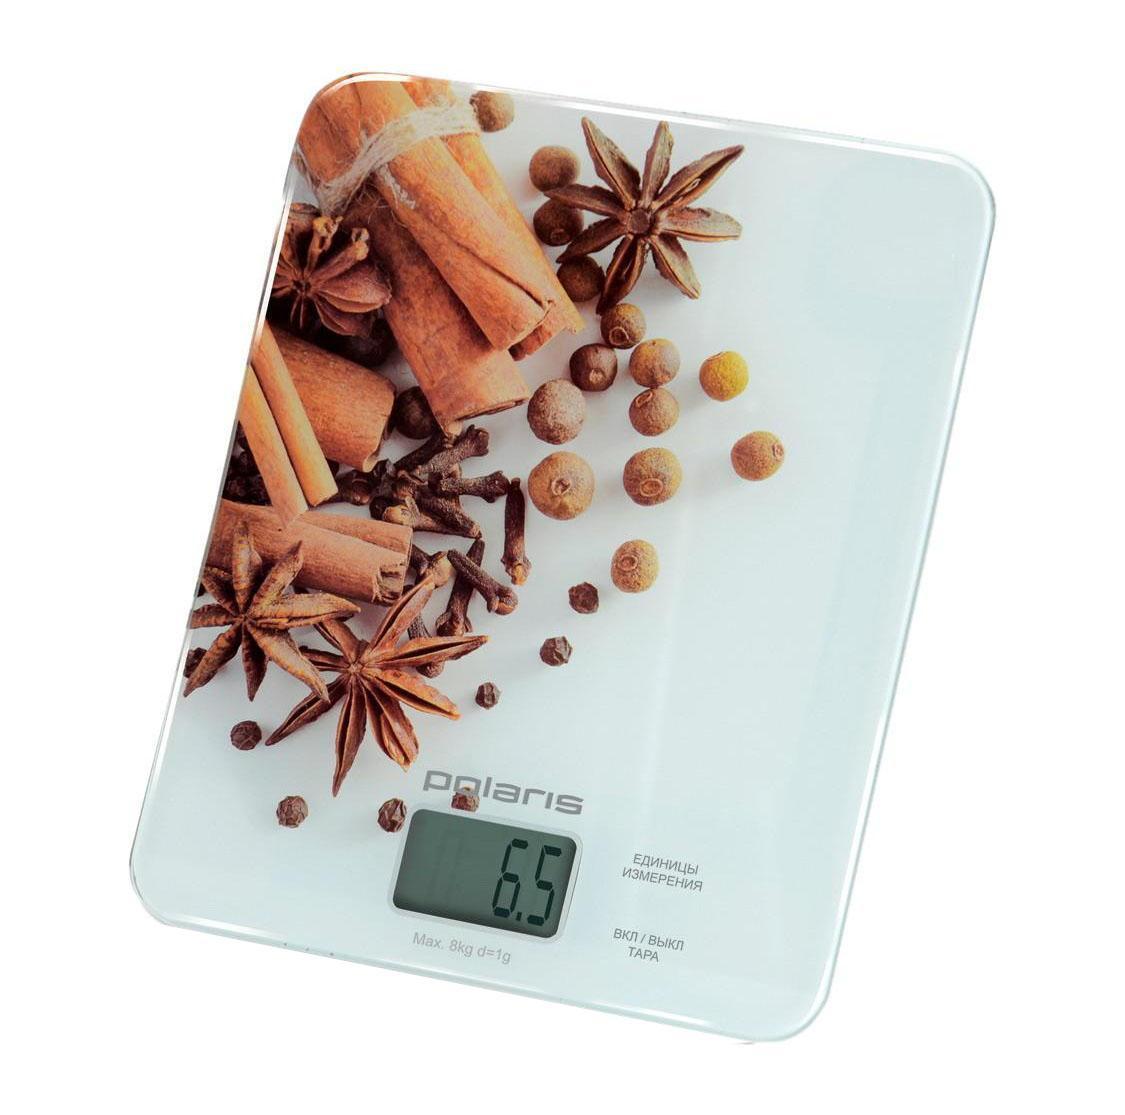 Polaris PKS 0832DG Spices кухонные весы